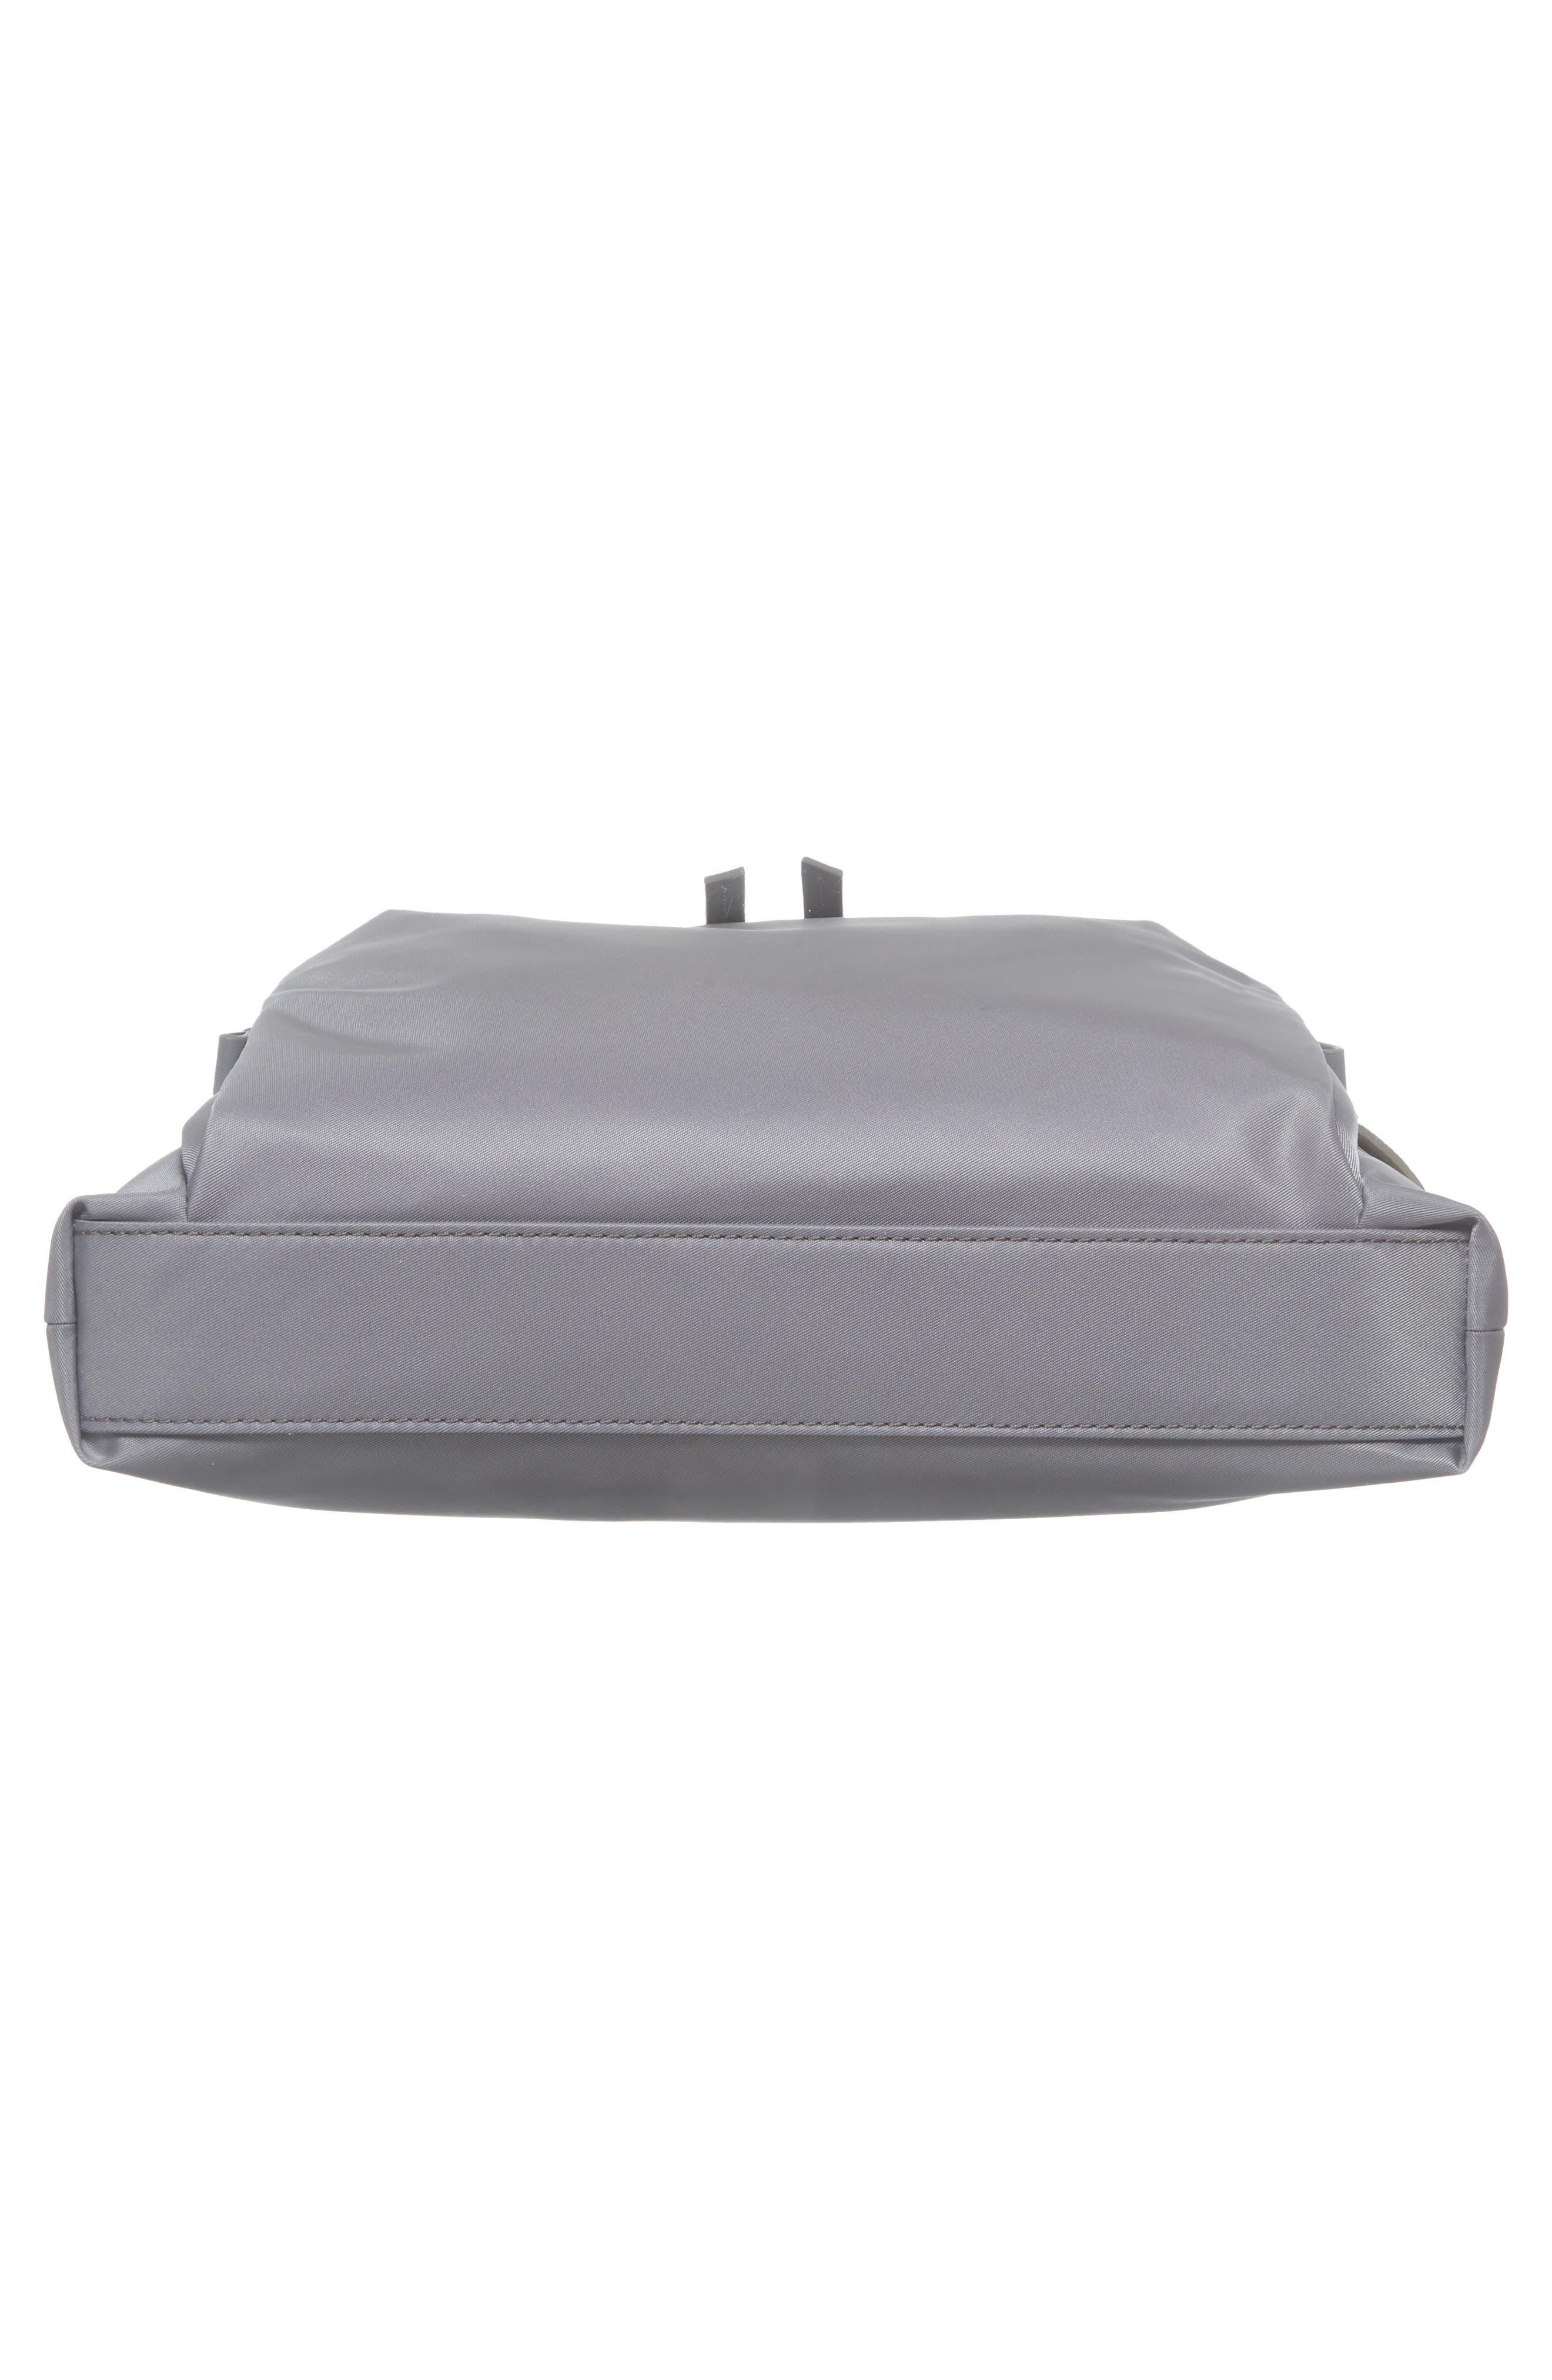 Voyager - Capri Nylon Crossbody Bag,                             Alternate thumbnail 6, color,                             Grey